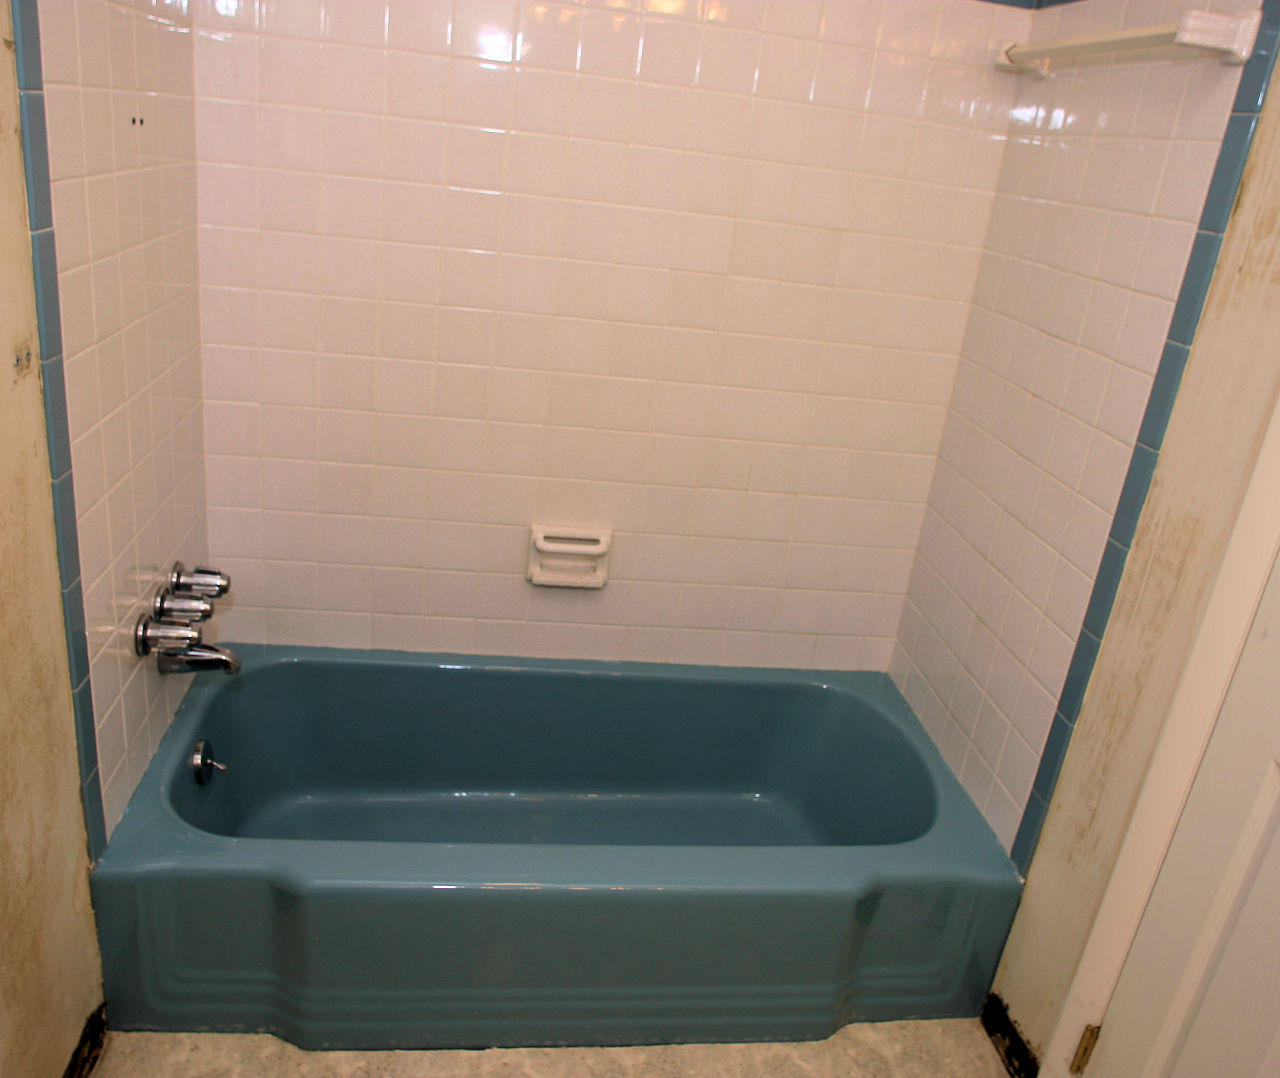 Bathroom Tile Tub & Shower Repairs | Pittsburgh & East Ohio low as $250